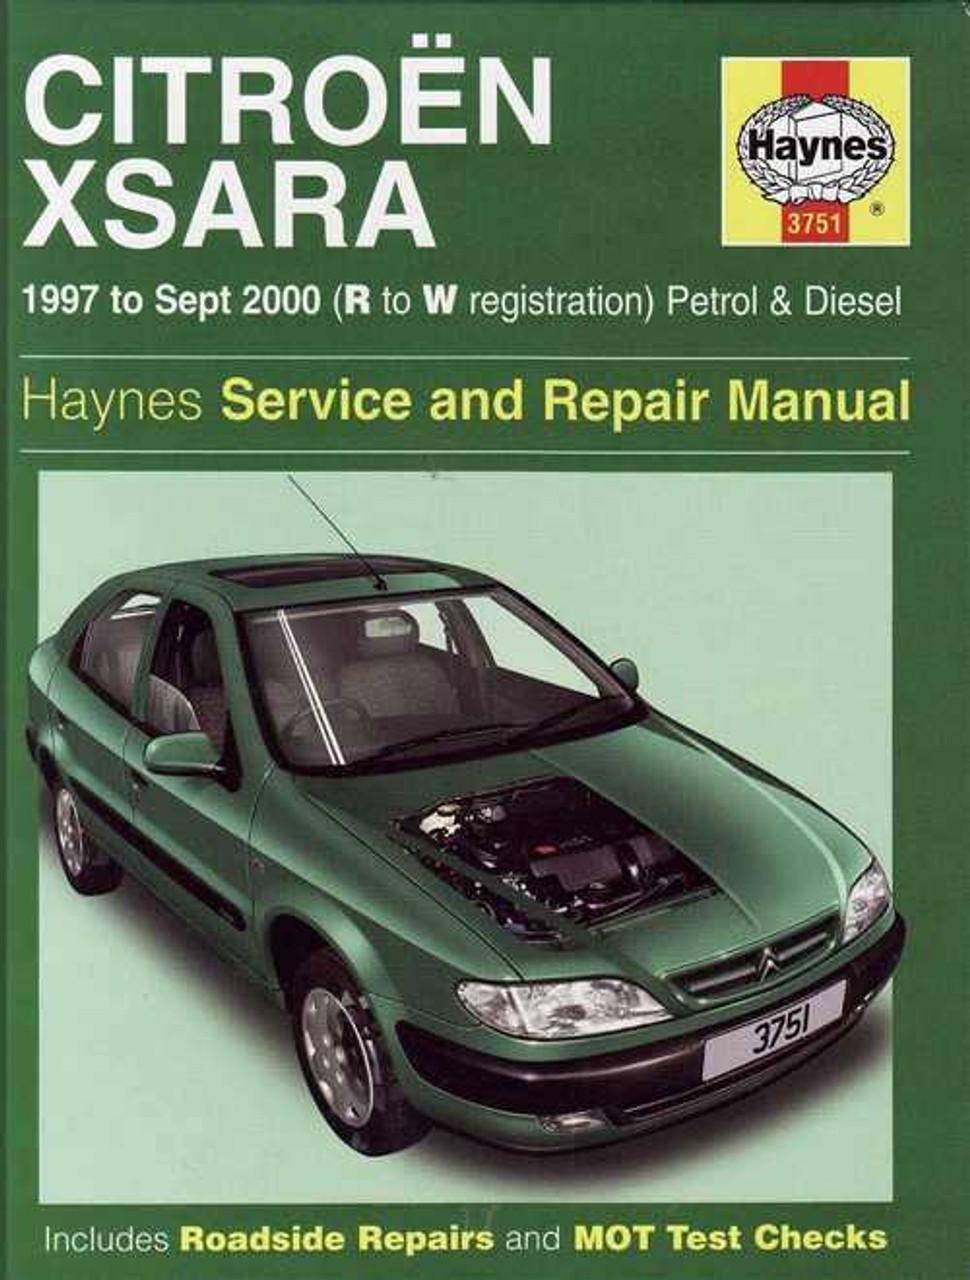 citroen xsara 1997 2000 workshop manual rh automotobookshop com au citroën xsara picasso 2.0 hdi - 2000 - manual de taller esp citroen xsara picasso 2000 manual